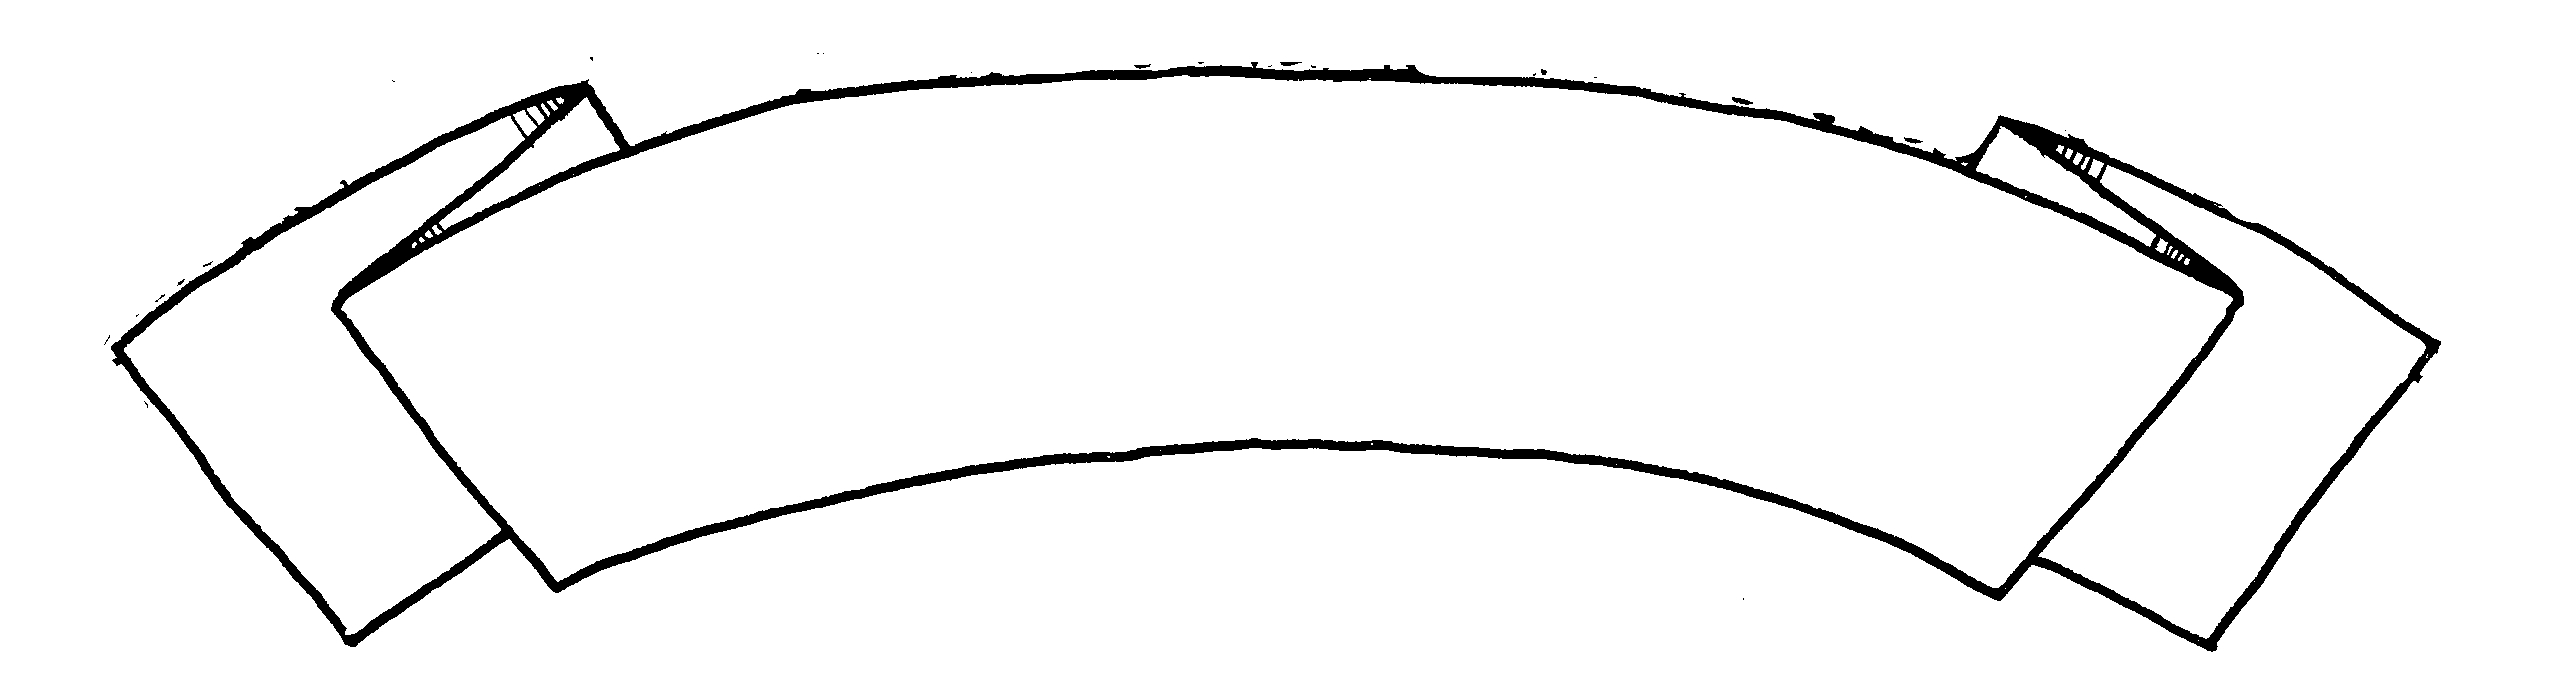 Free Clip Art Banner